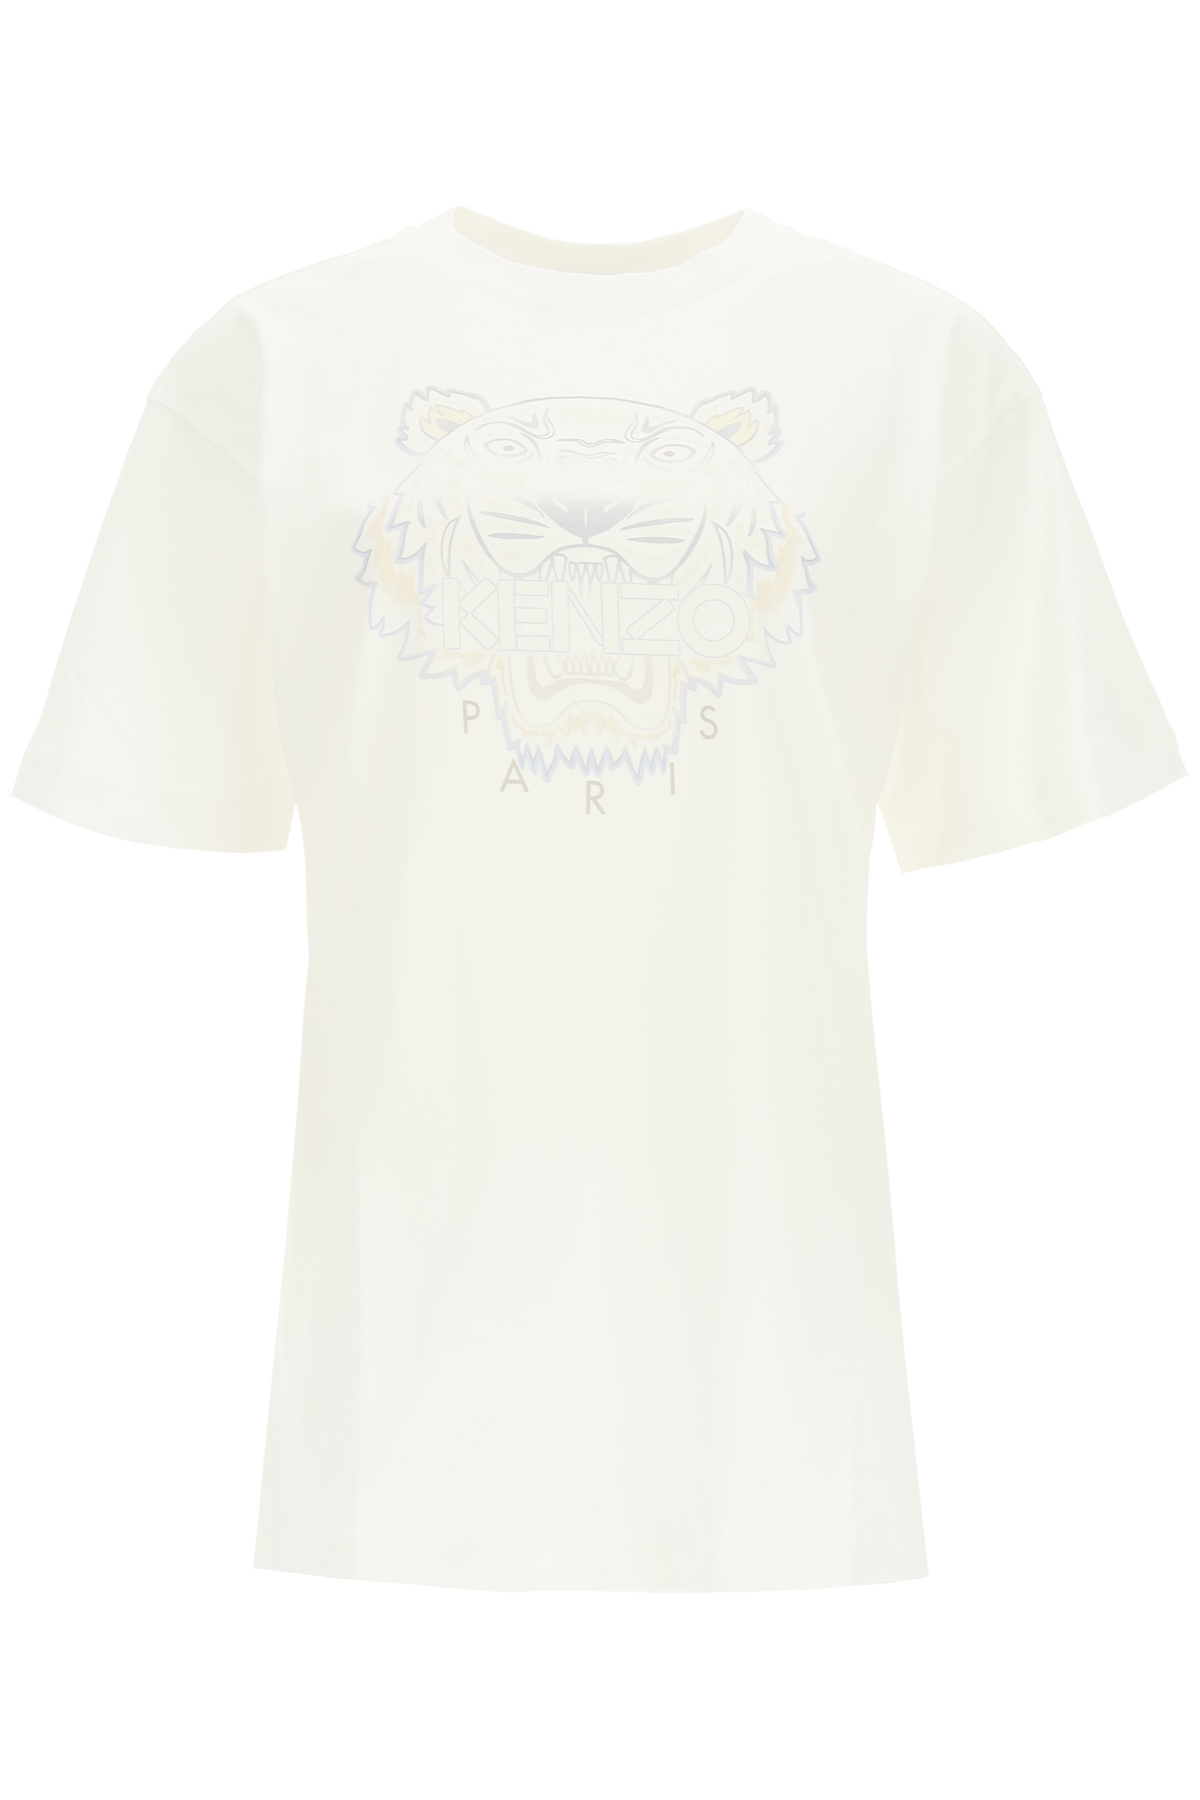 KENZO GRADIENT TIGER PRINT T-SHIRT XS White, Grey, Beige Cotton